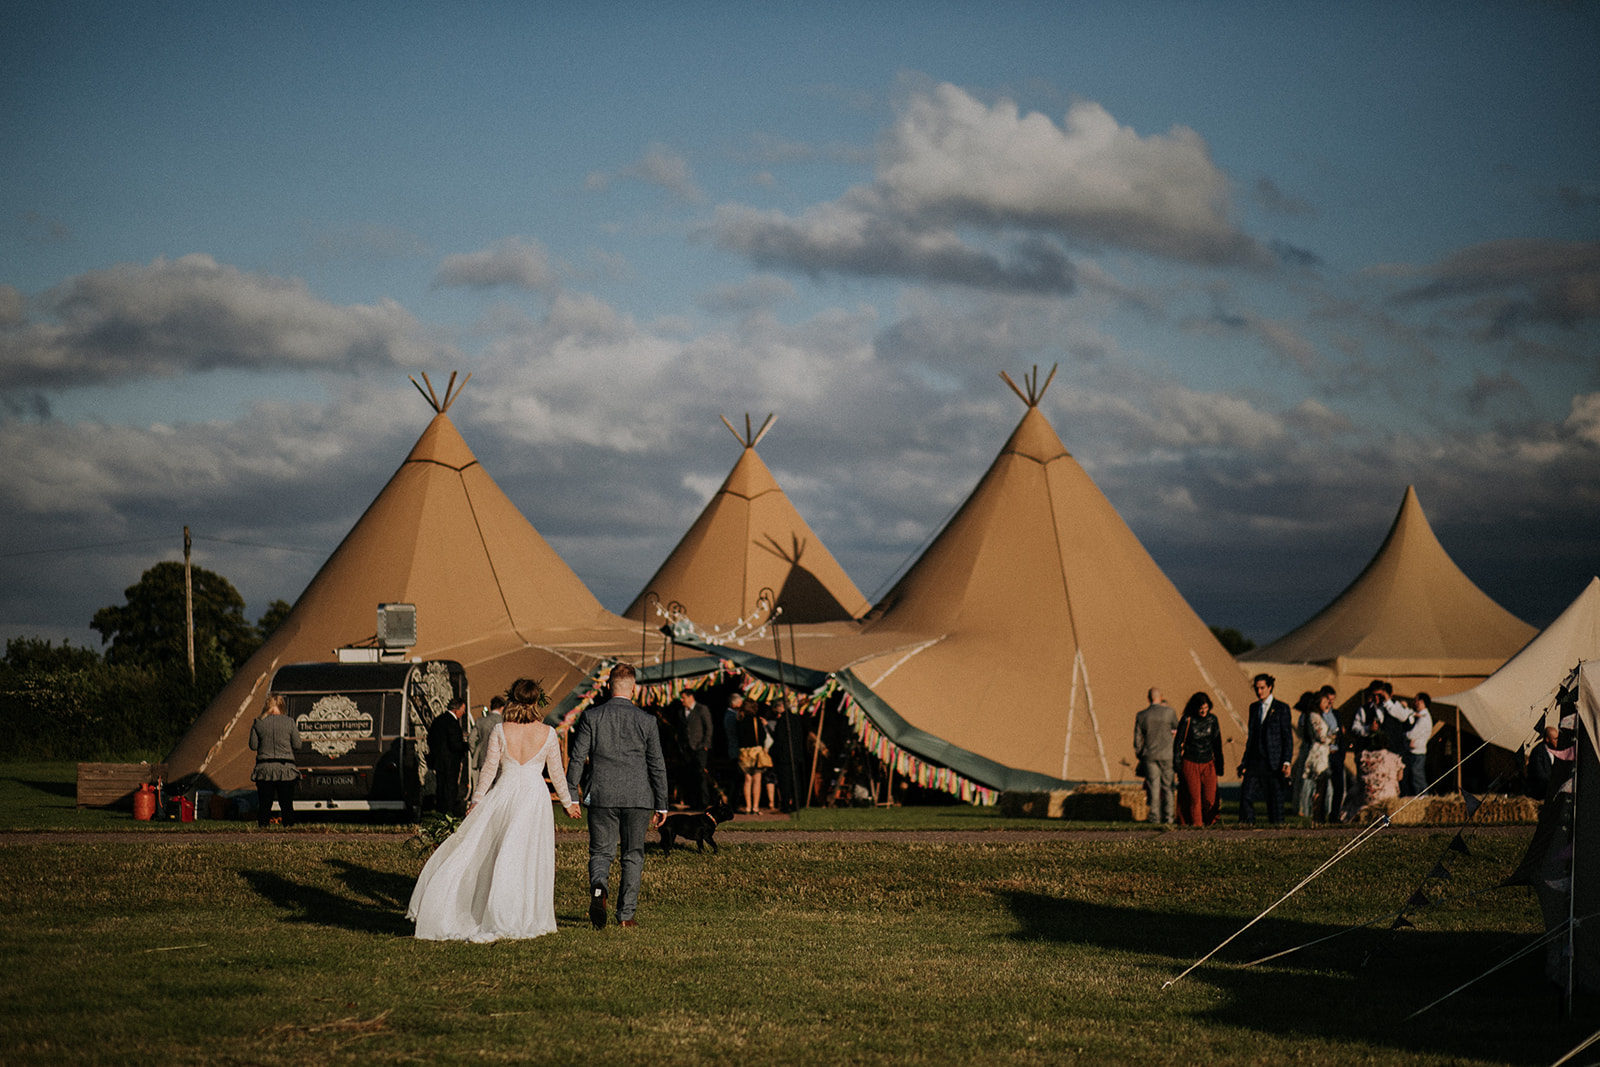 Tepee wedding celebration at Cattows Farm with Sami Tipi